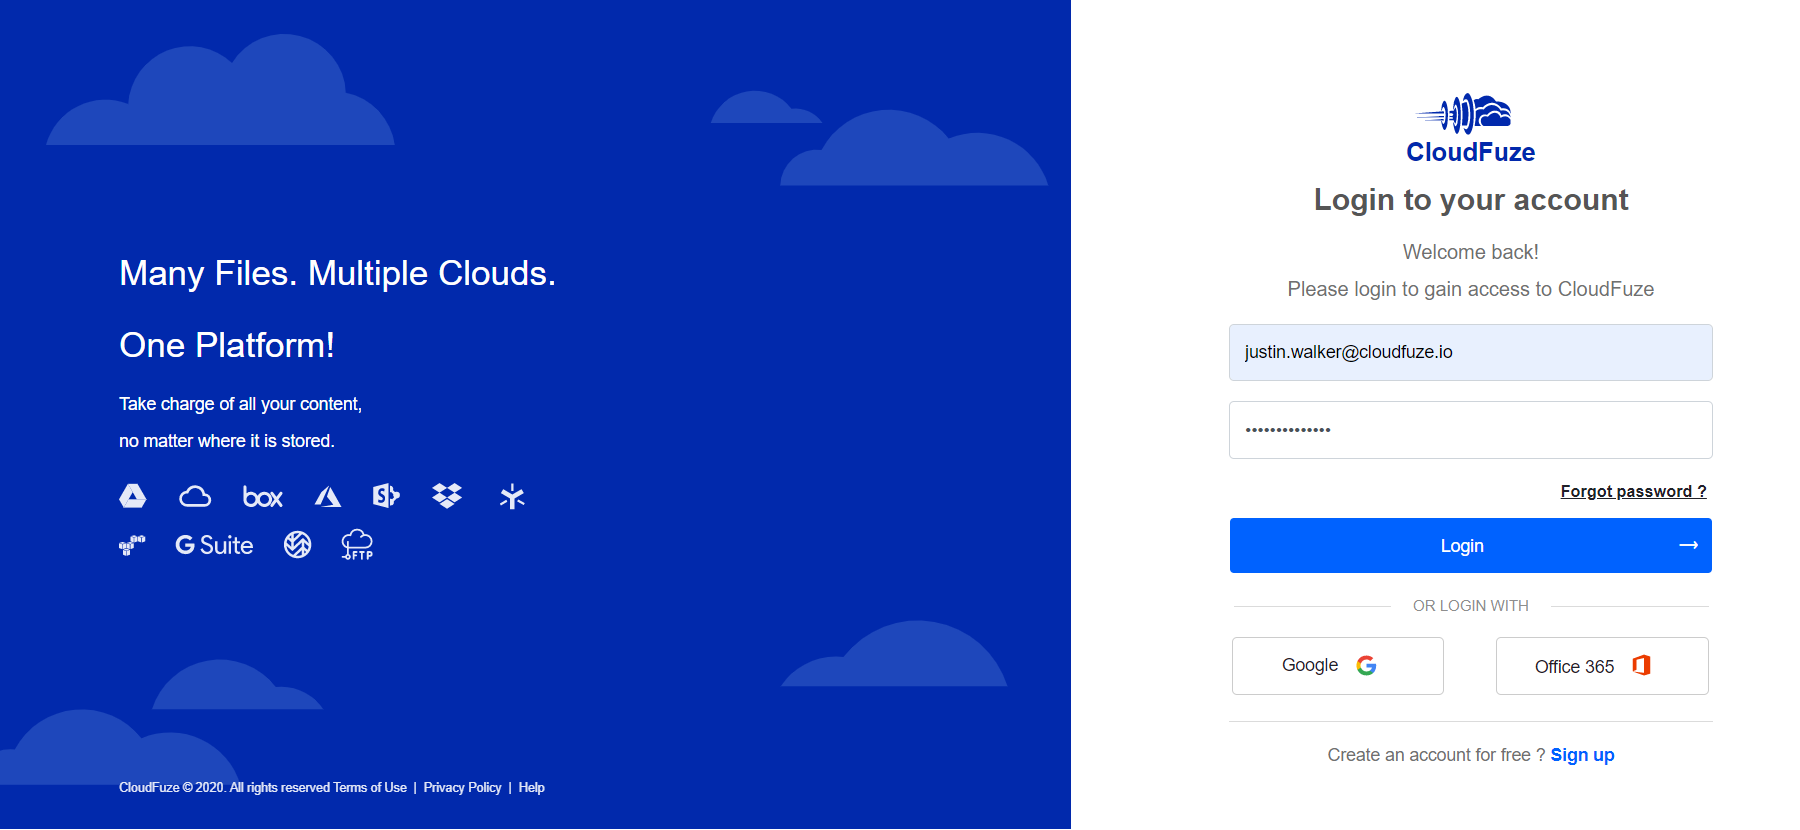 Login Credentials for CloudFuze Webapp